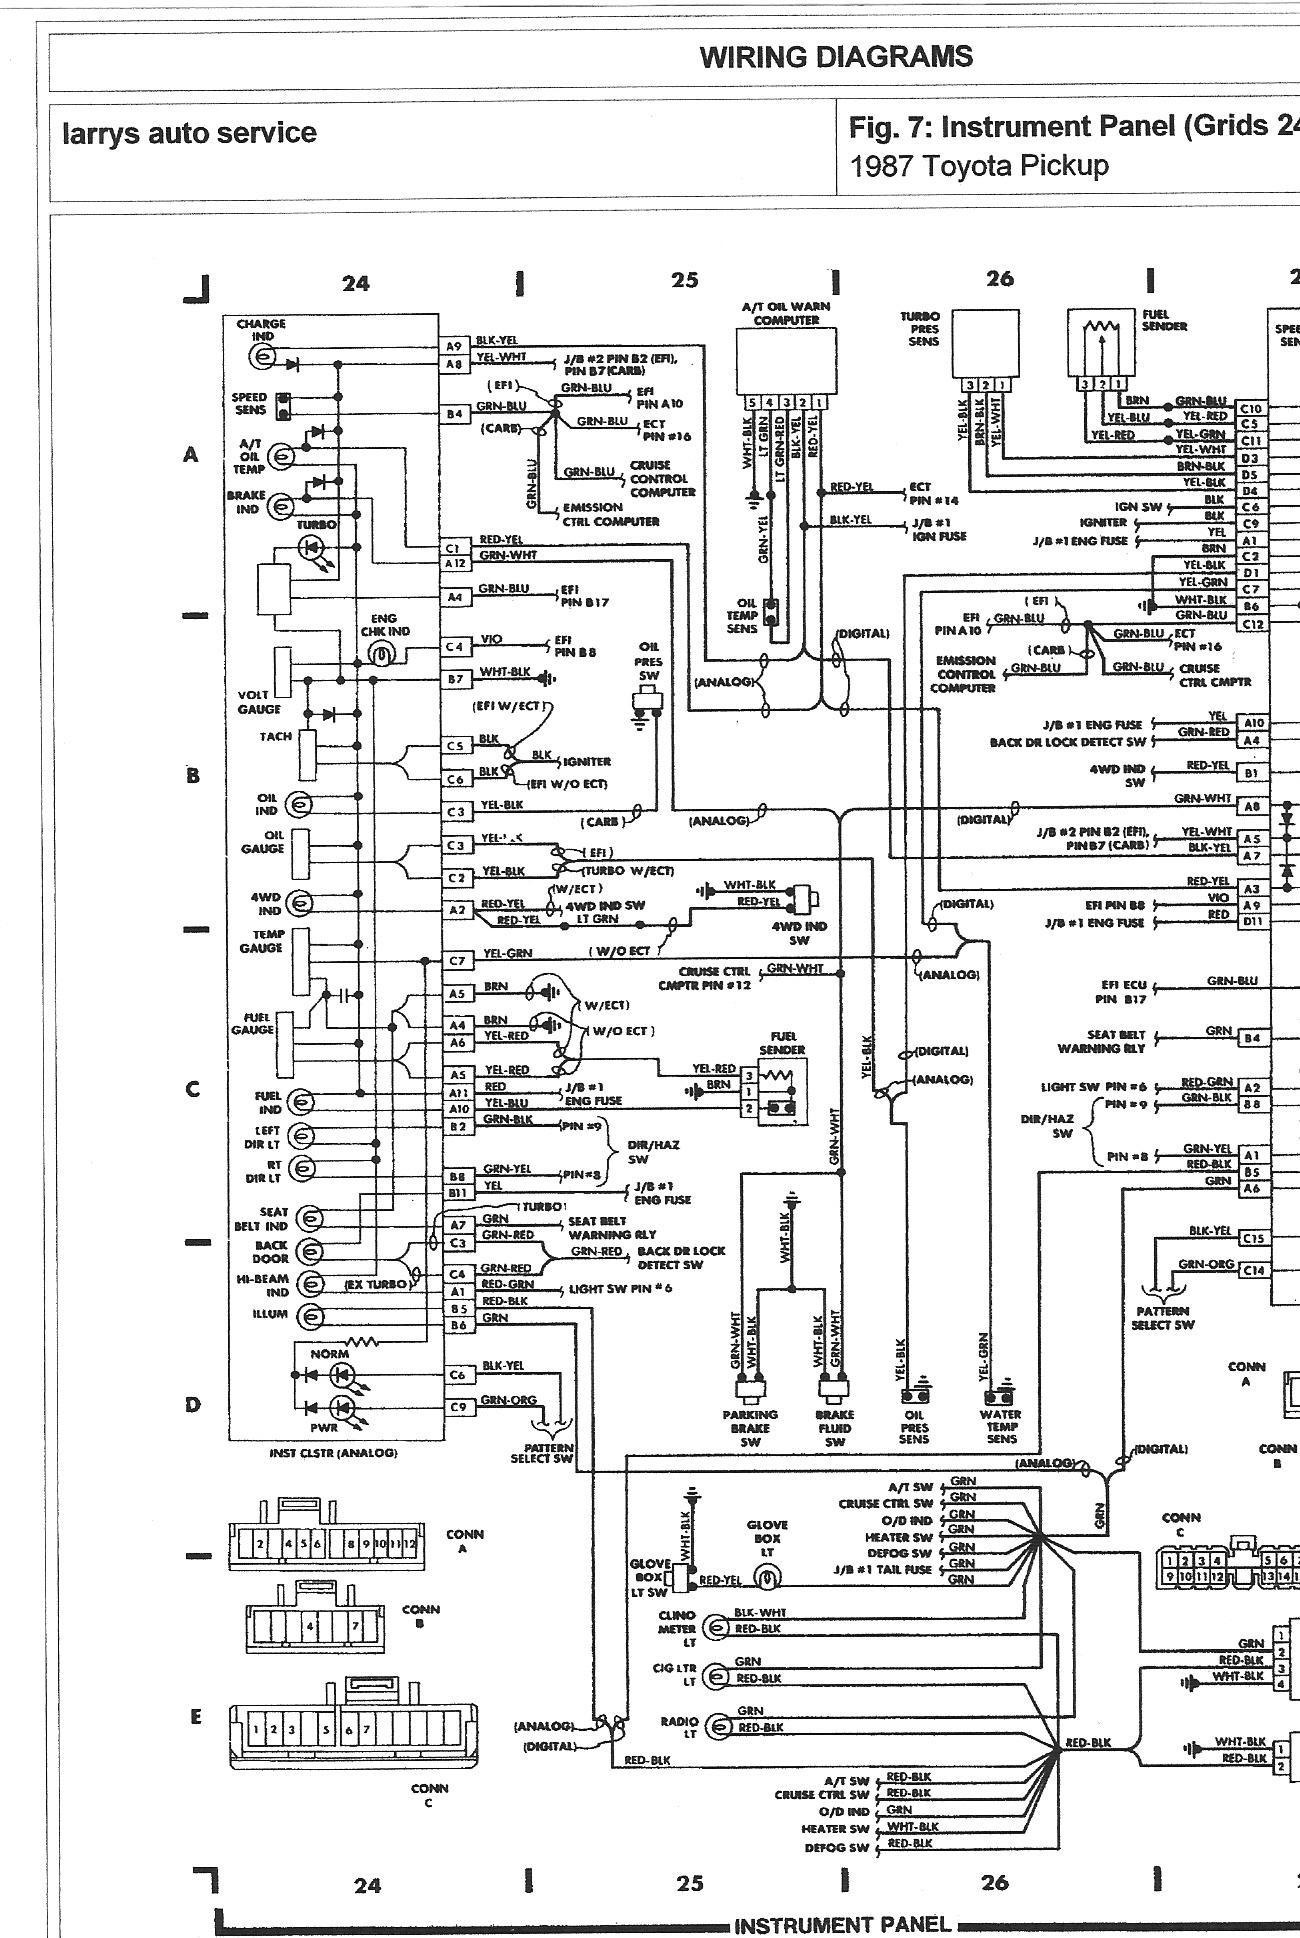 Toyota 22r Engine Diagram toyota Pickup Ignition Wiring Wiring Diagram Paper Of Toyota 22r Engine Diagram toyota Engine Schematics Wiring Diagram Paper